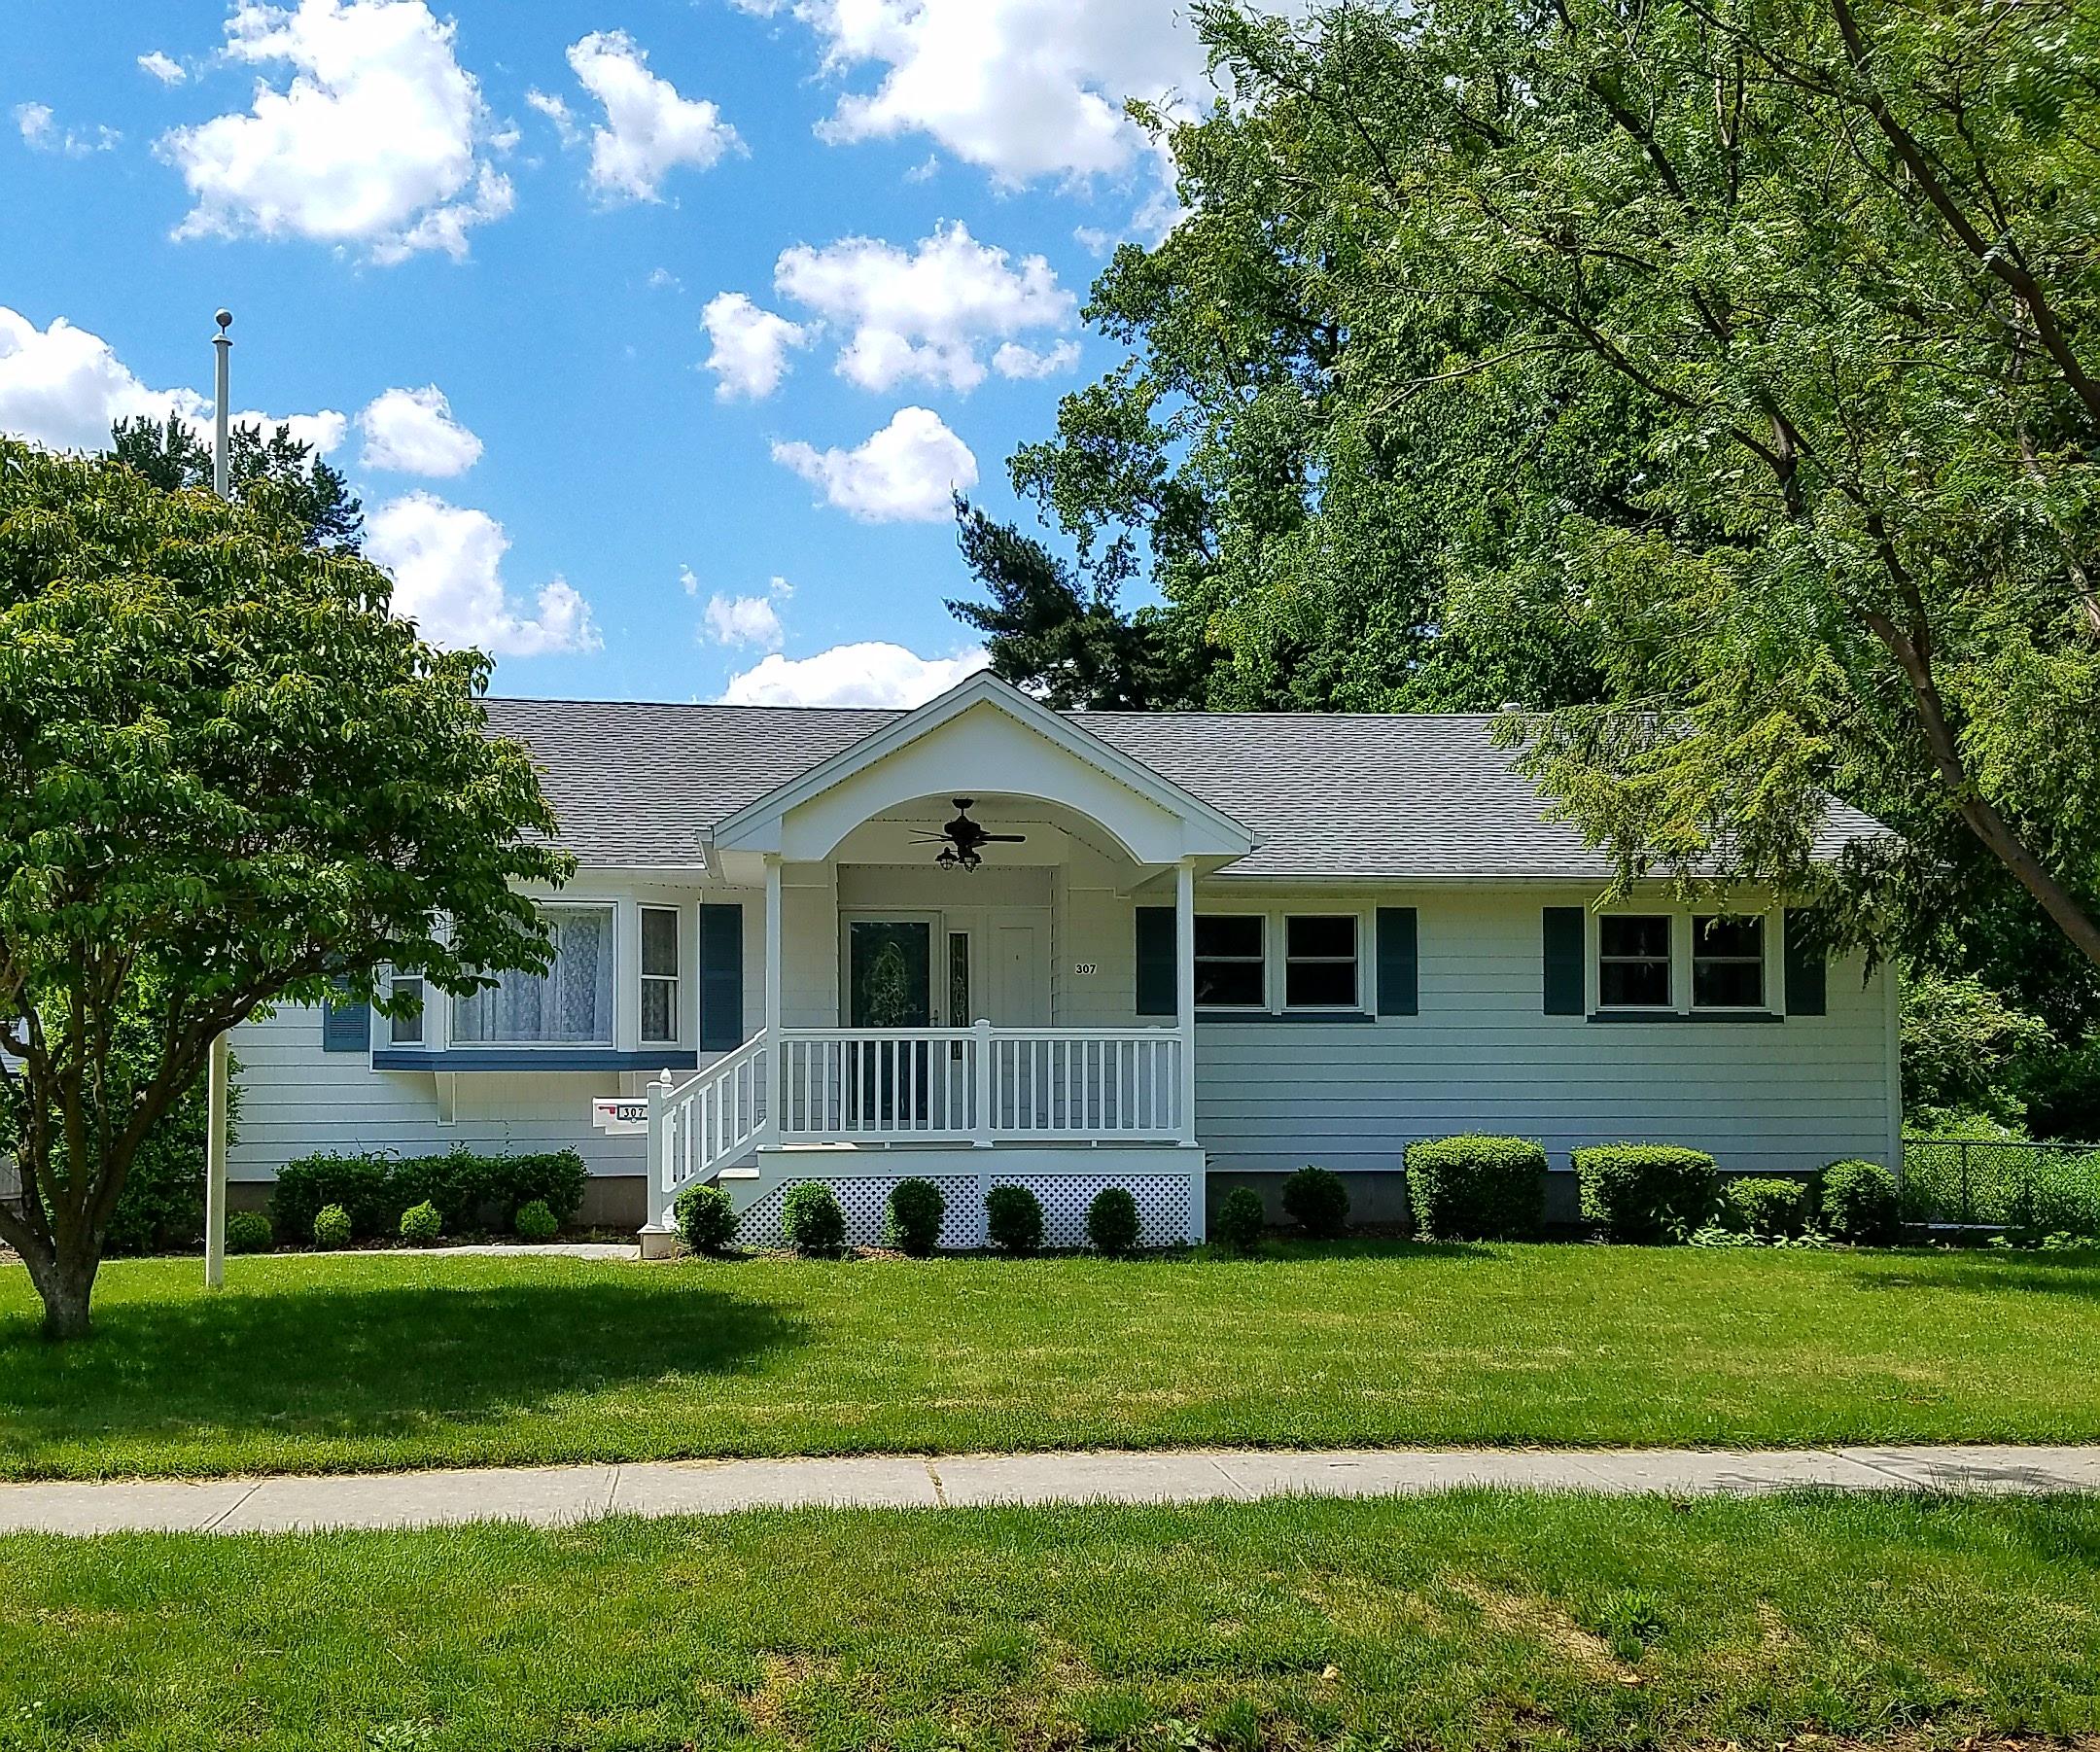 307 Central Avenue, Cranford <br/> Sold $595,000